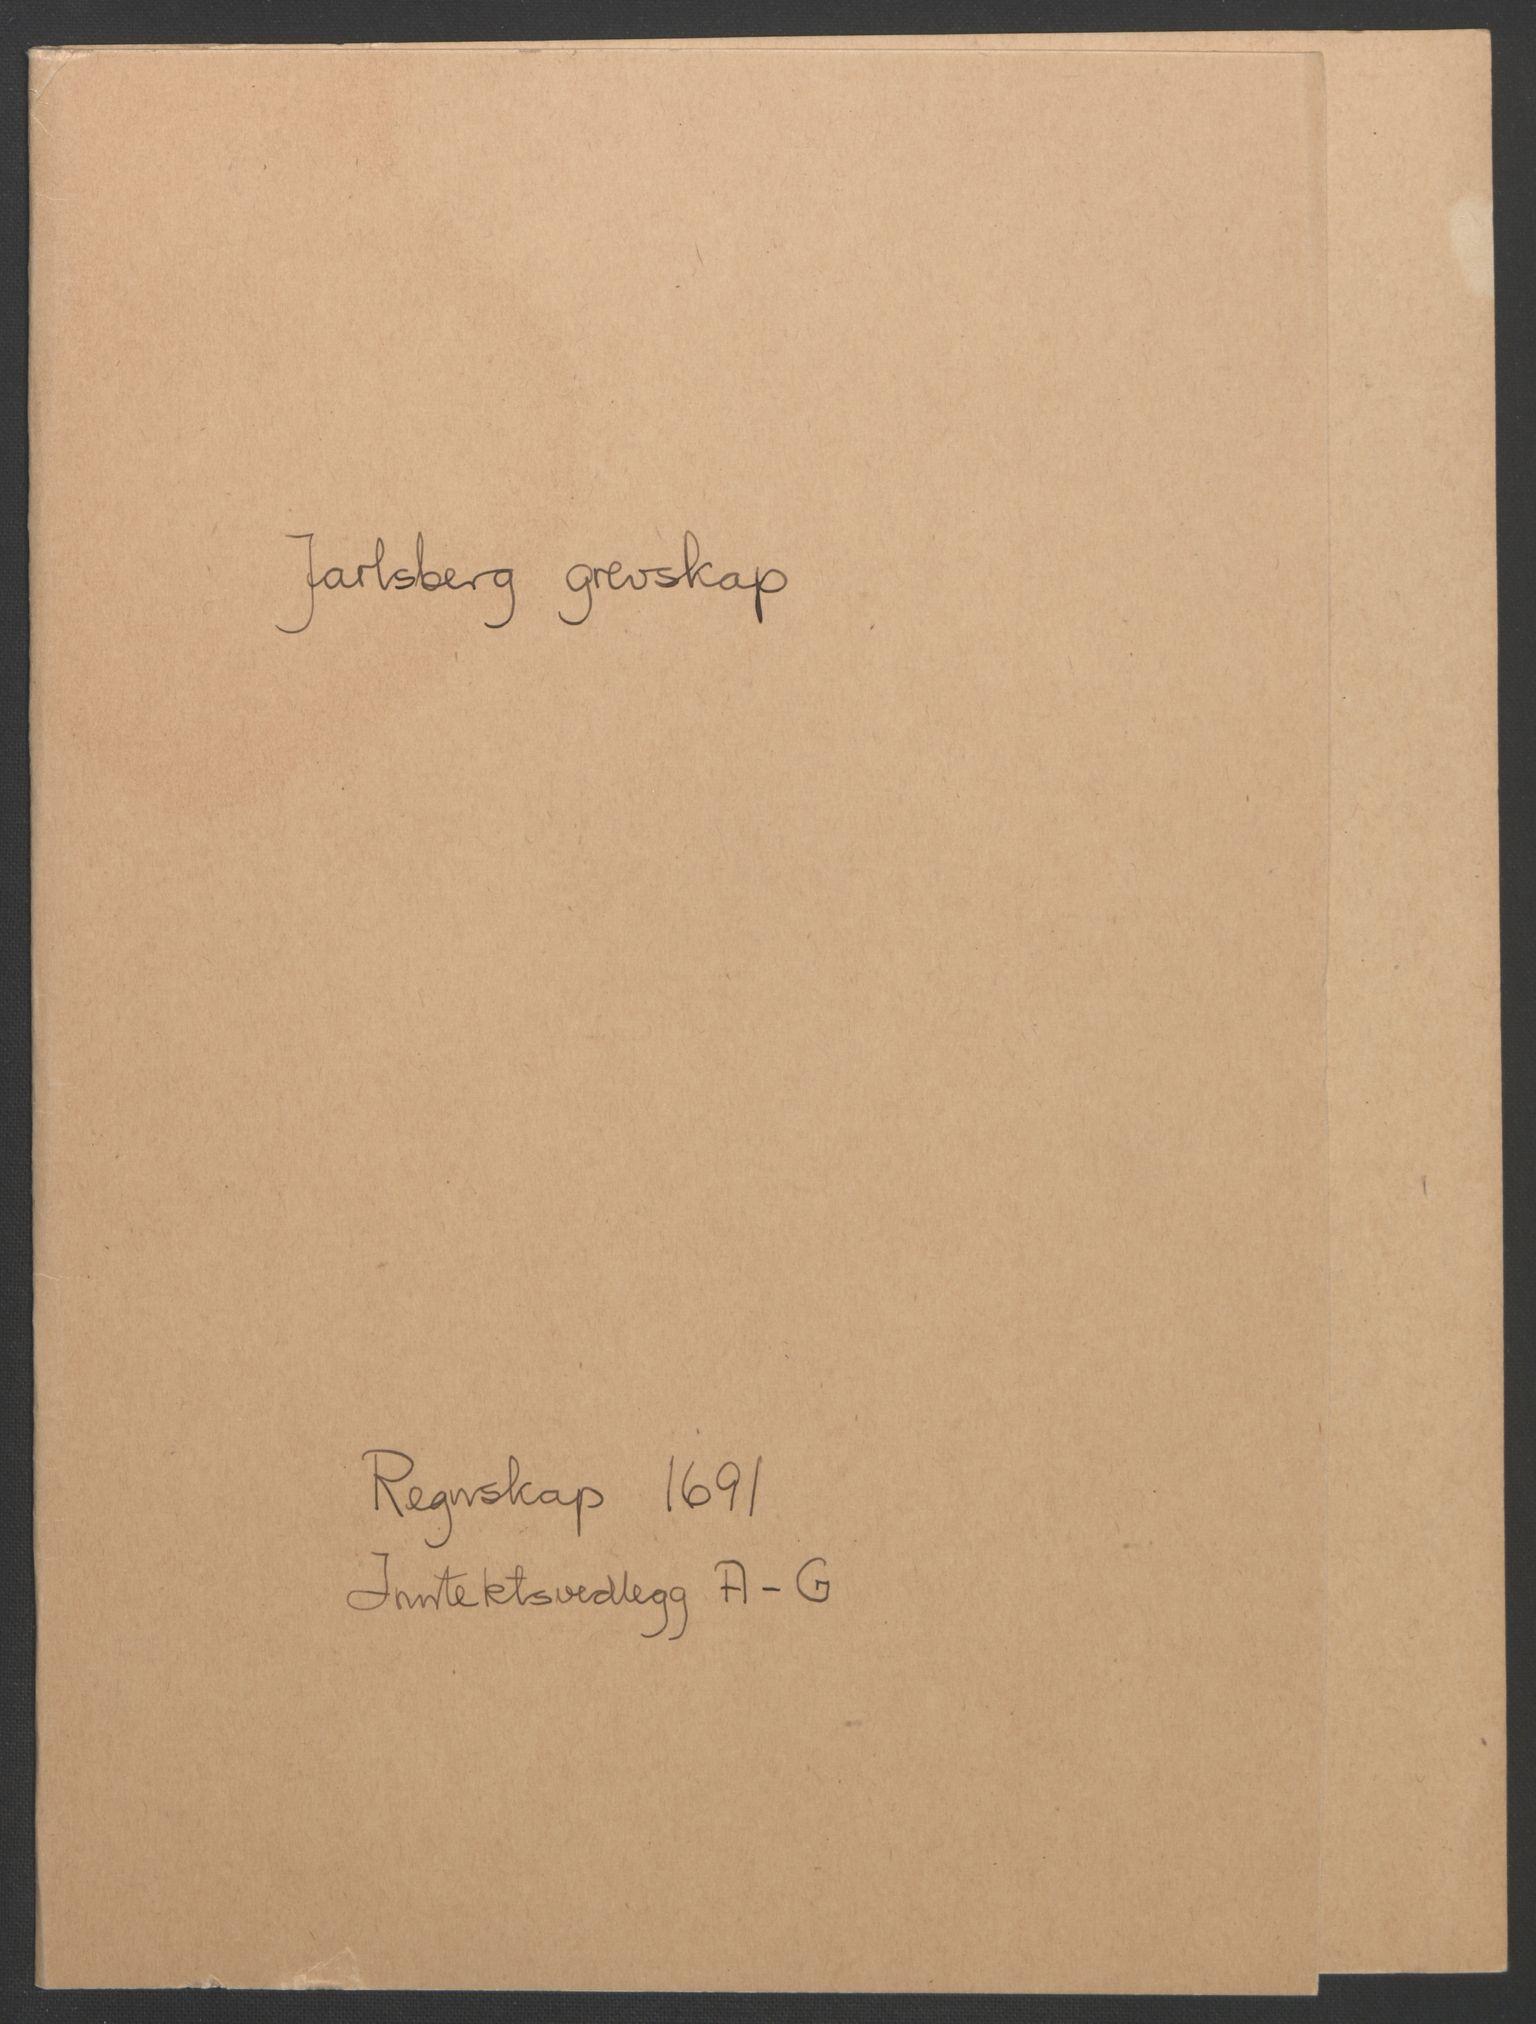 RA, Rentekammeret inntil 1814, Reviderte regnskaper, Fogderegnskap, R32/L1864: Fogderegnskap Jarlsberg grevskap, 1691, s. 2